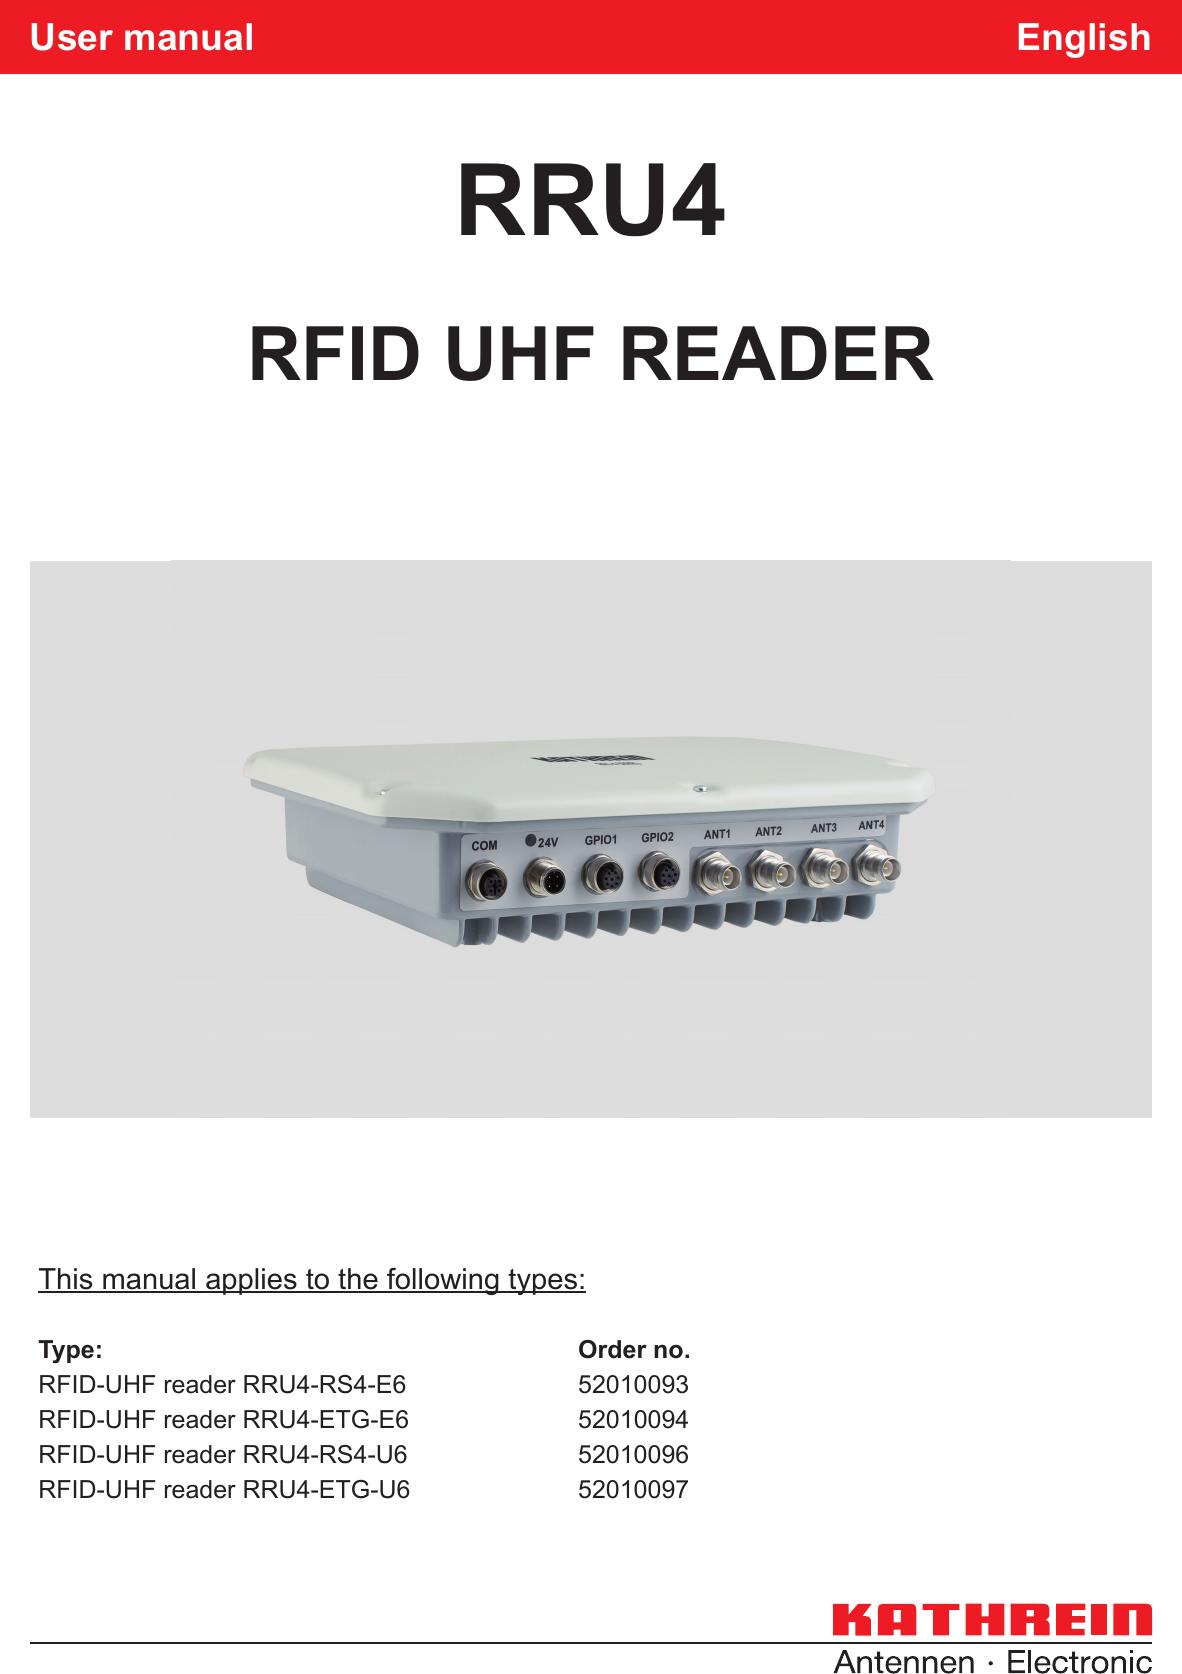 Kathrein Sachsen Rru4etgu6 Uhf Rfid Reader User Manual En Stand A Indd Ic